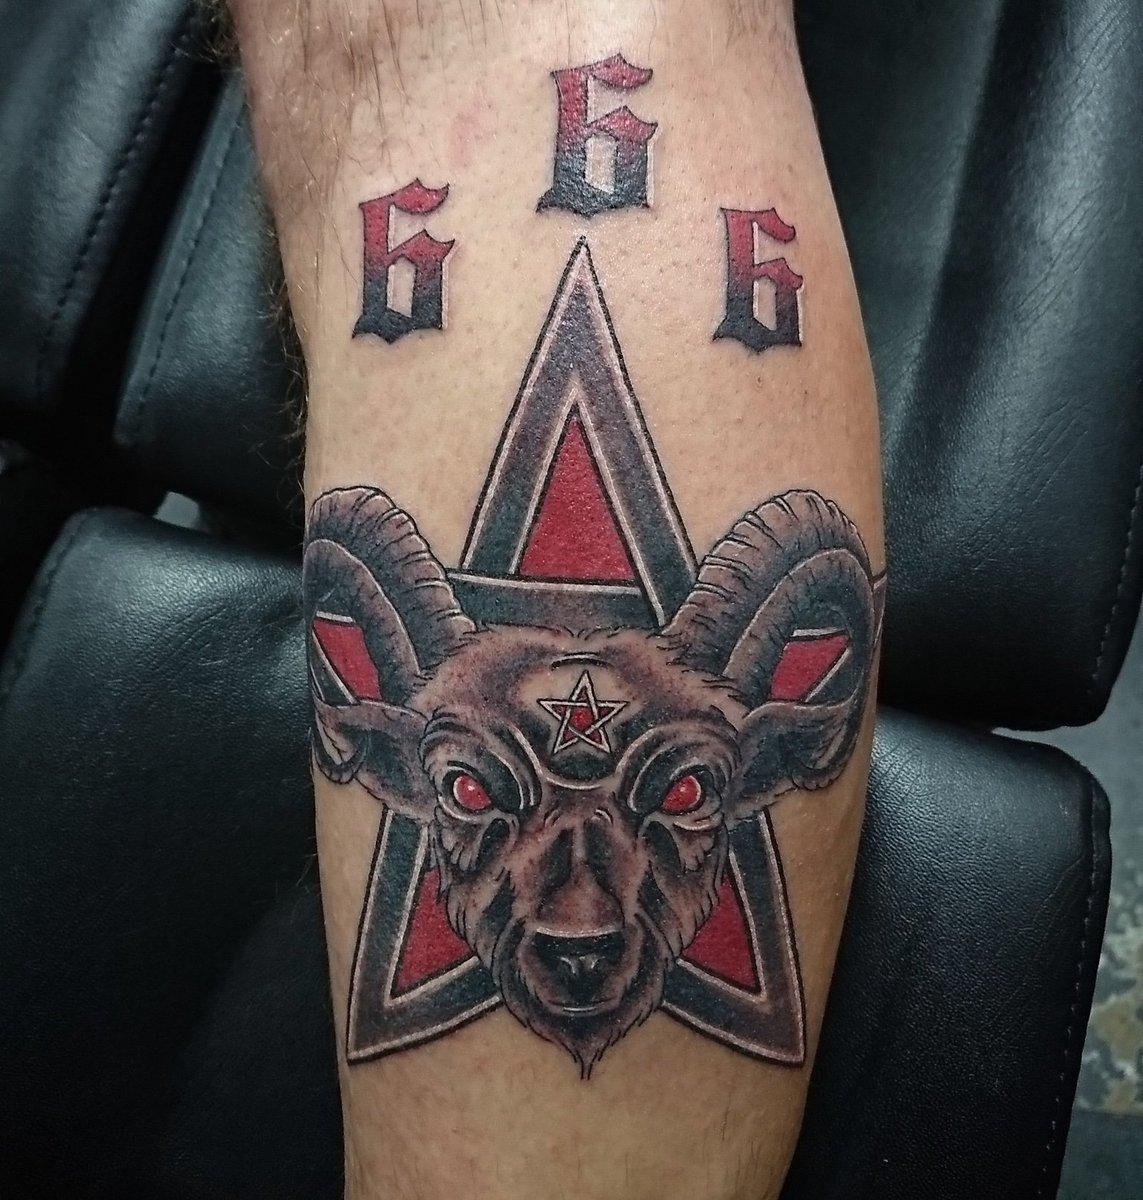 Sammy Kent On Twitter Ram Pentagram Tattoo I Did Today